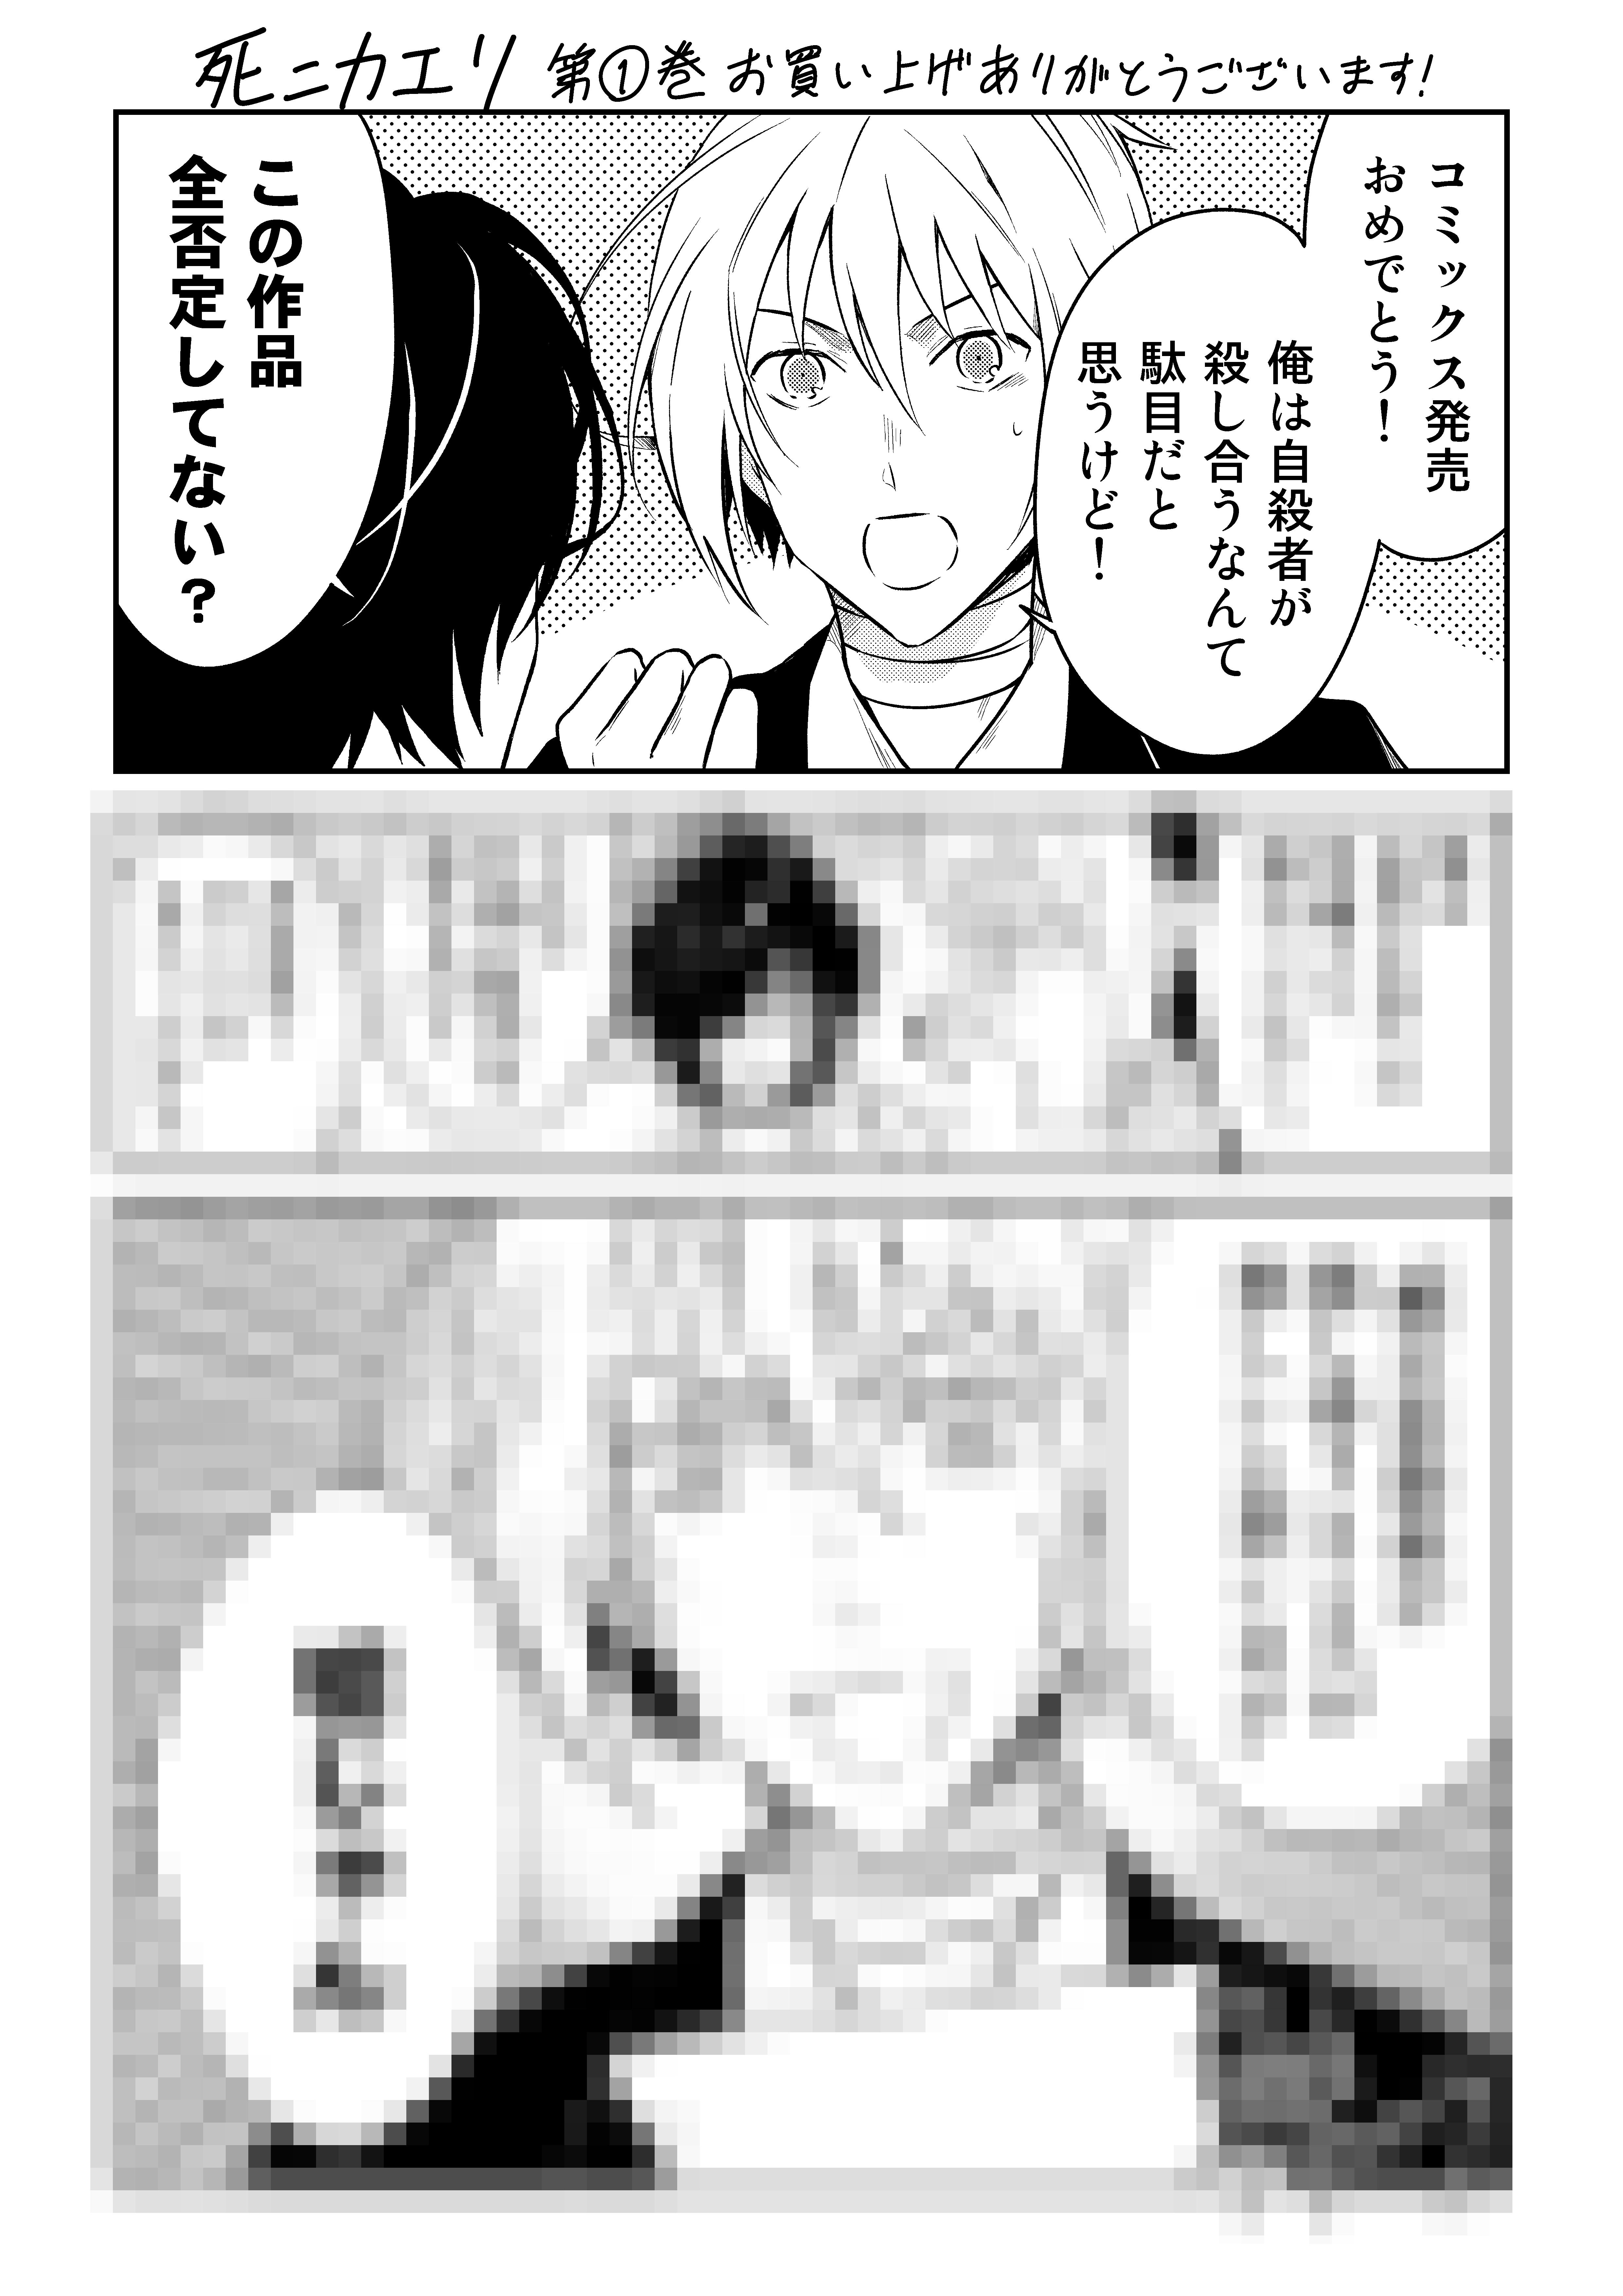 f:id:kuragebunch:20210129205058j:plain